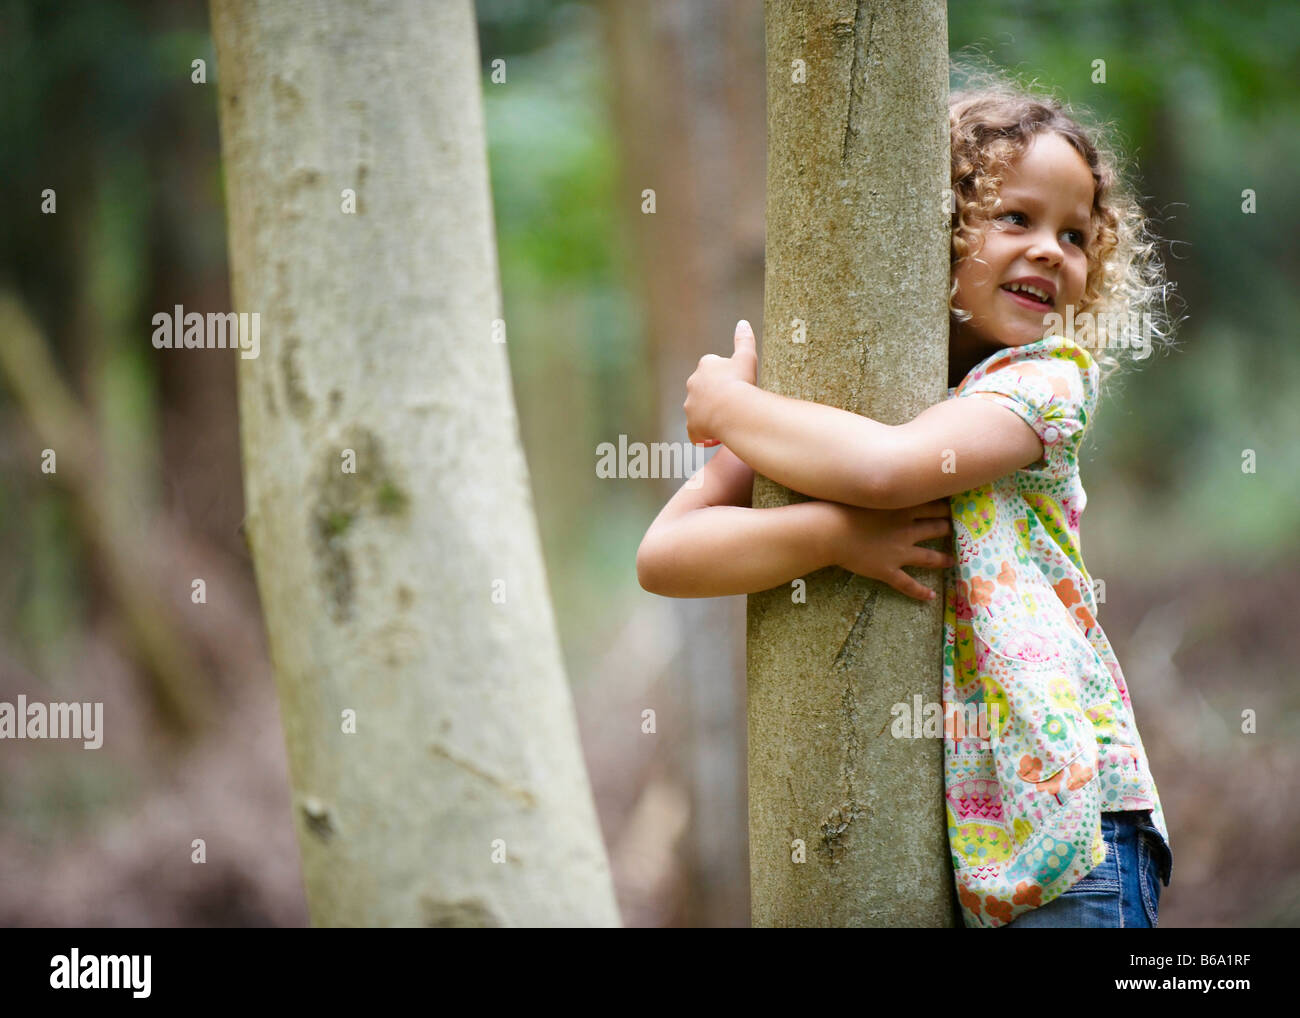 Young girl hugging tree smiling - Stock Image